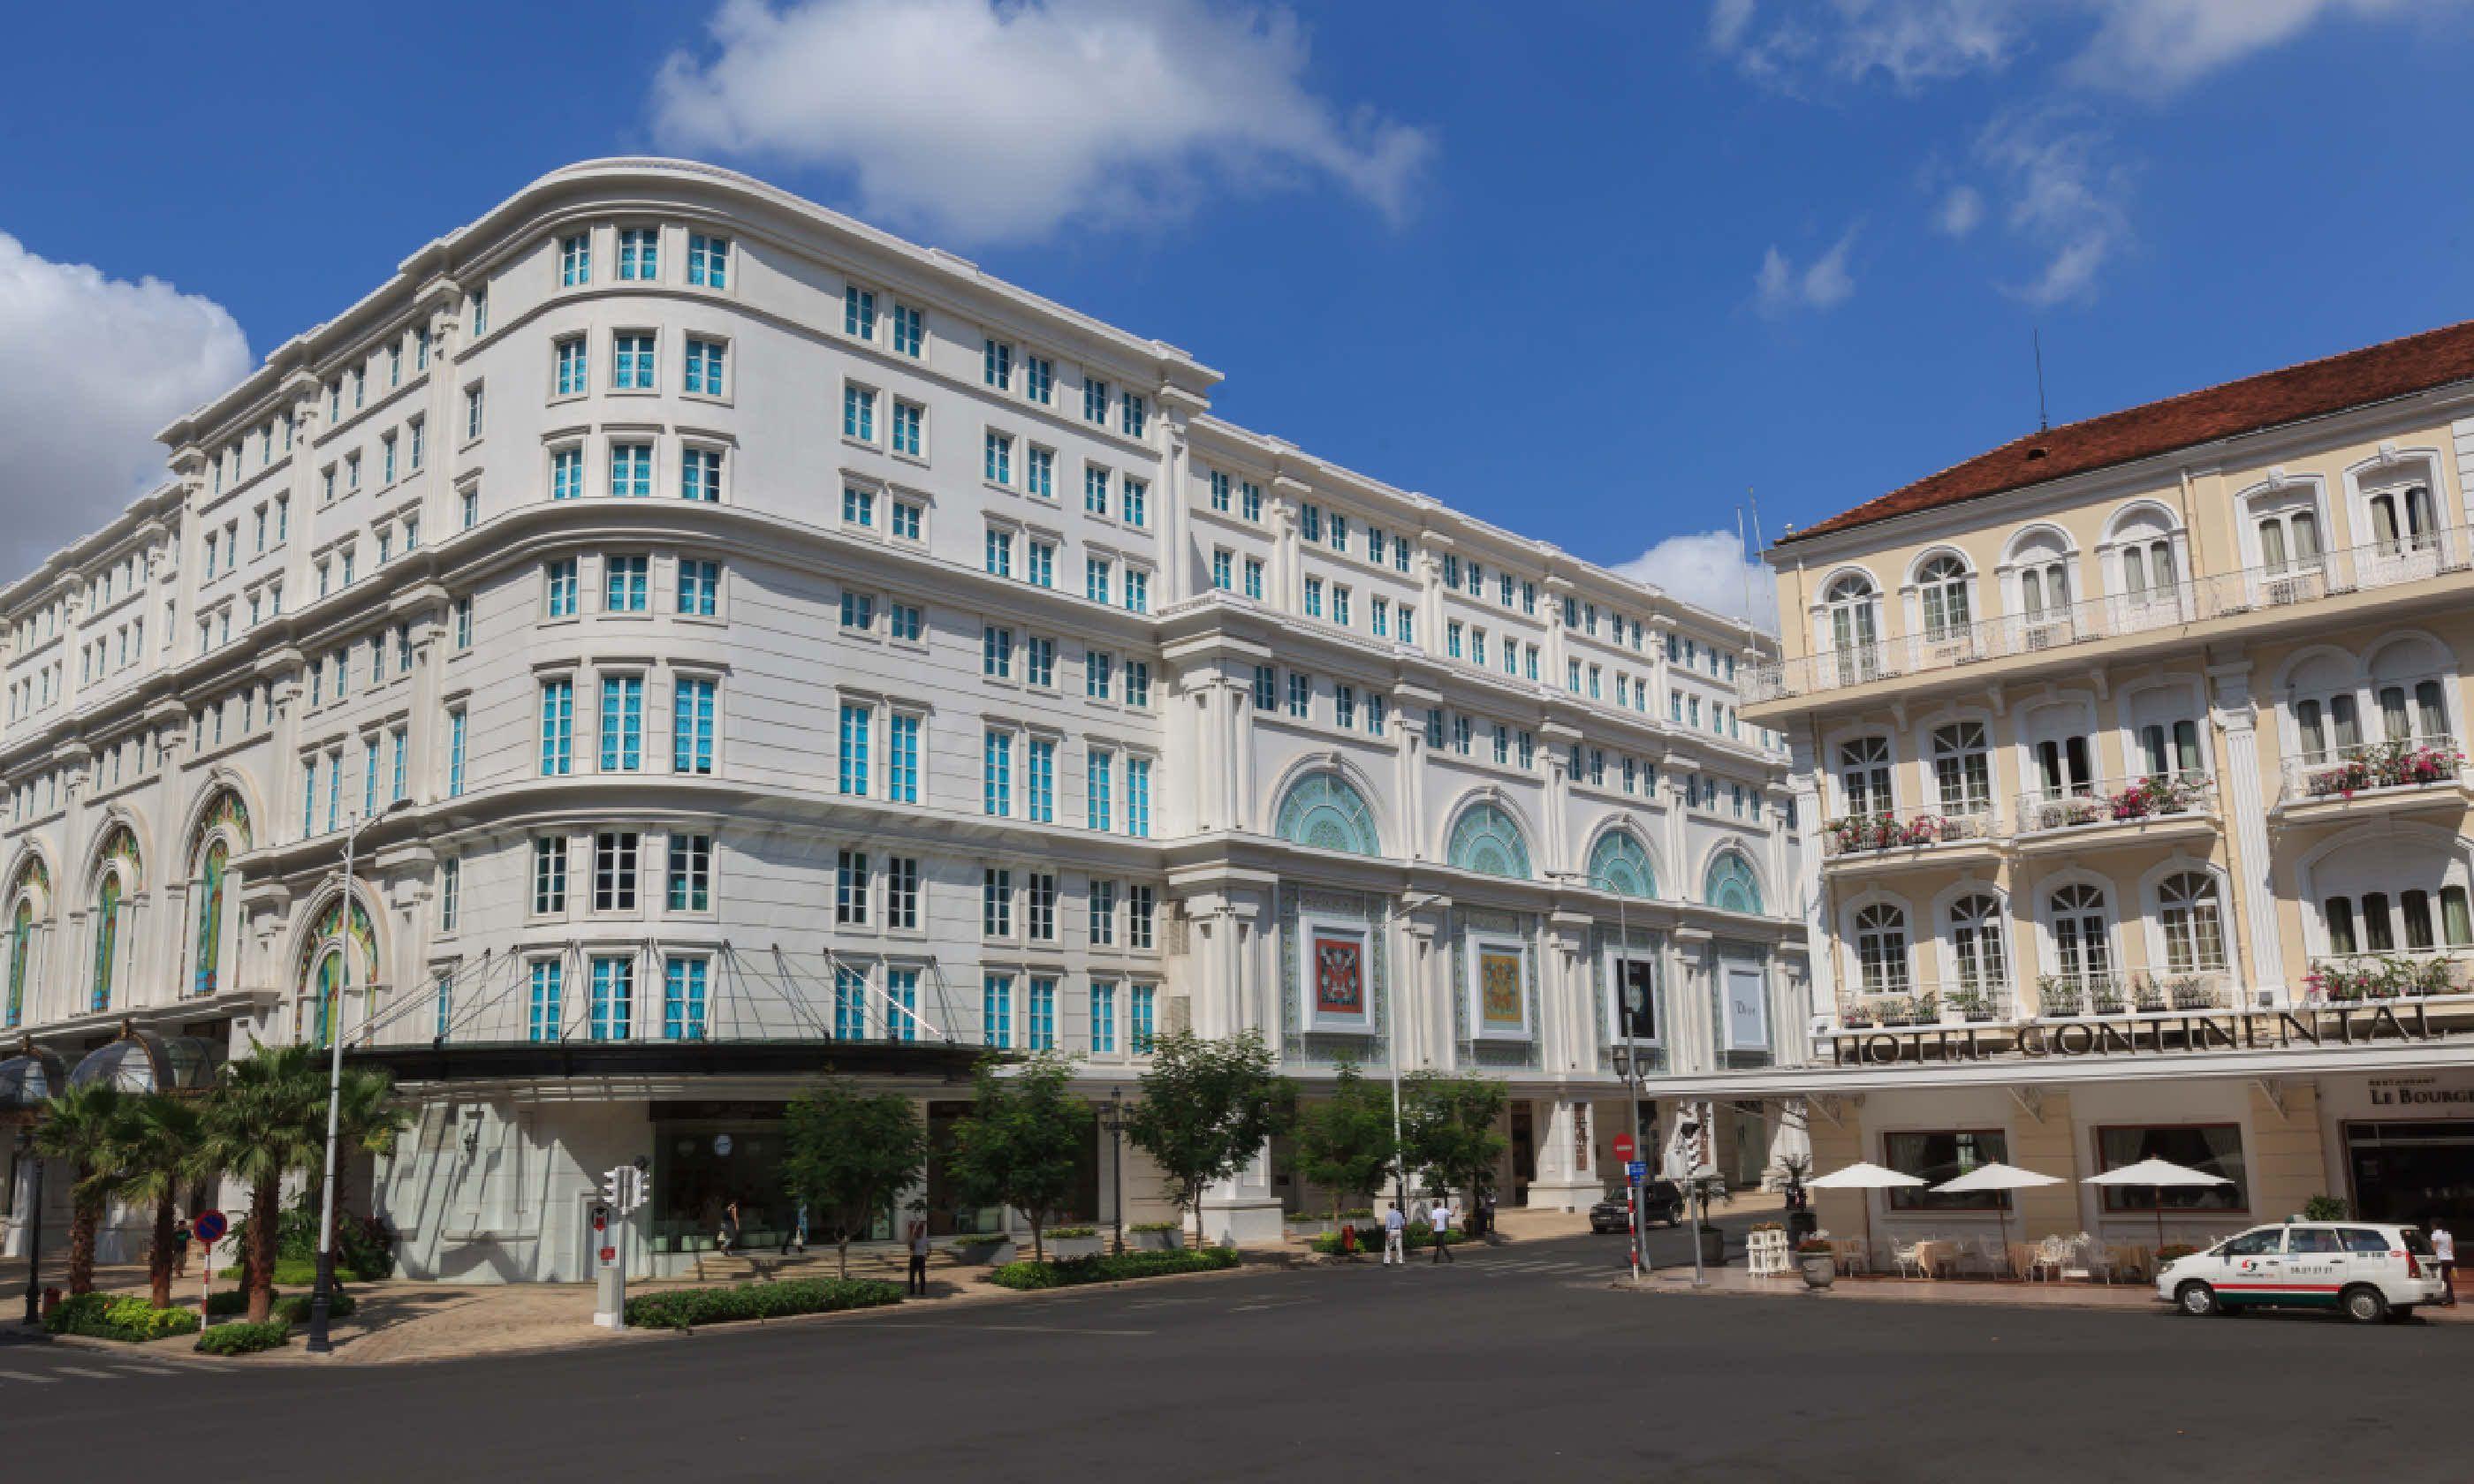 Hotel Continental (Shutterstock)